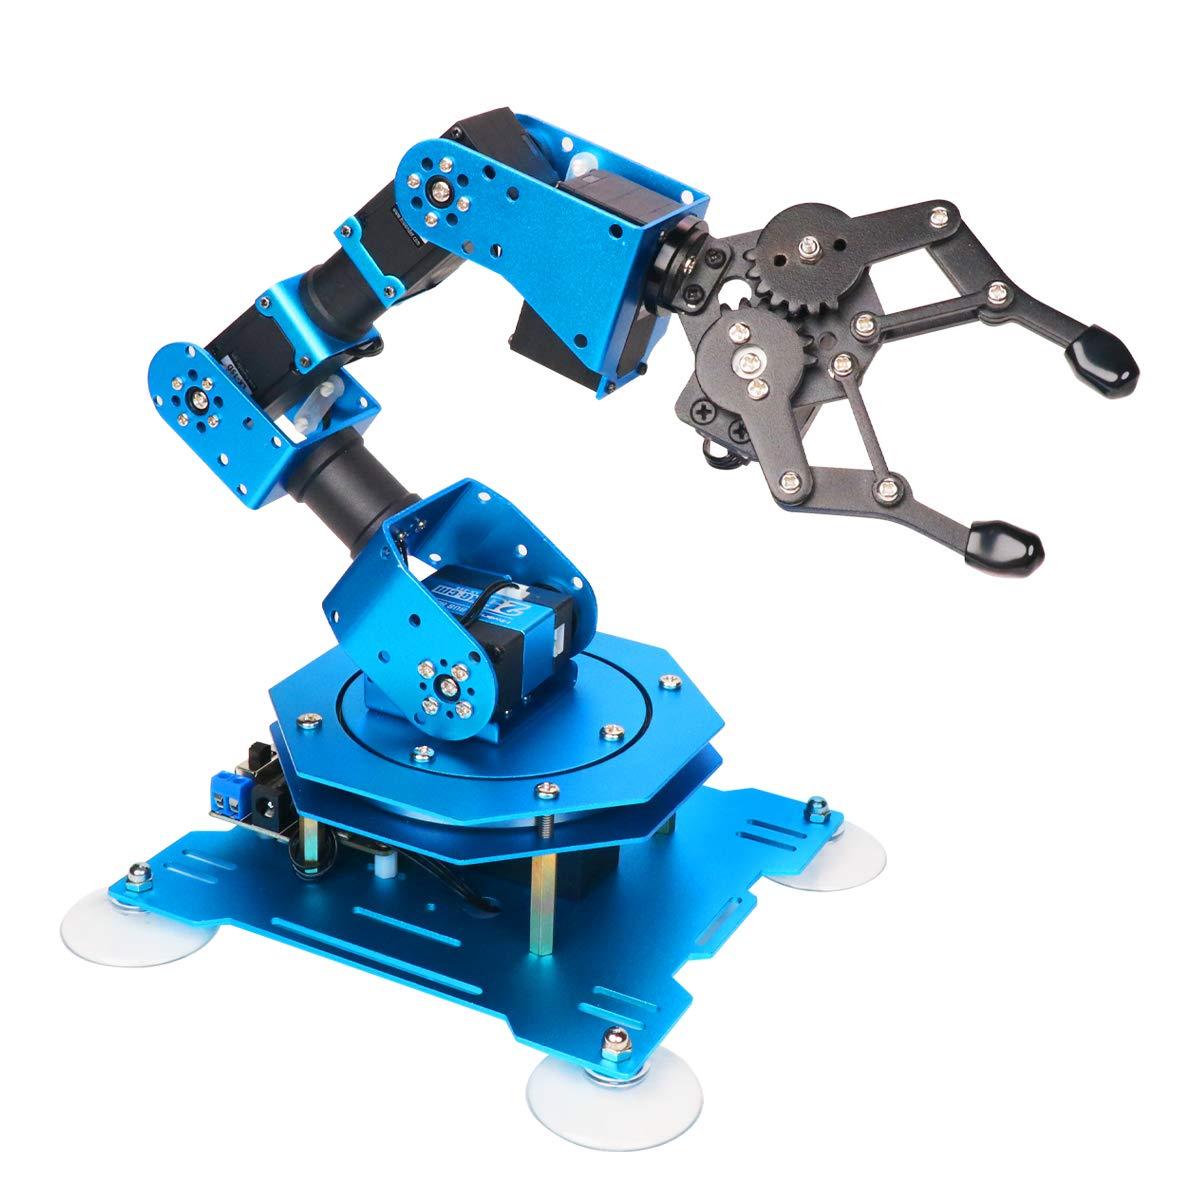 Robot Educativo para armar y programar LewanSoul a